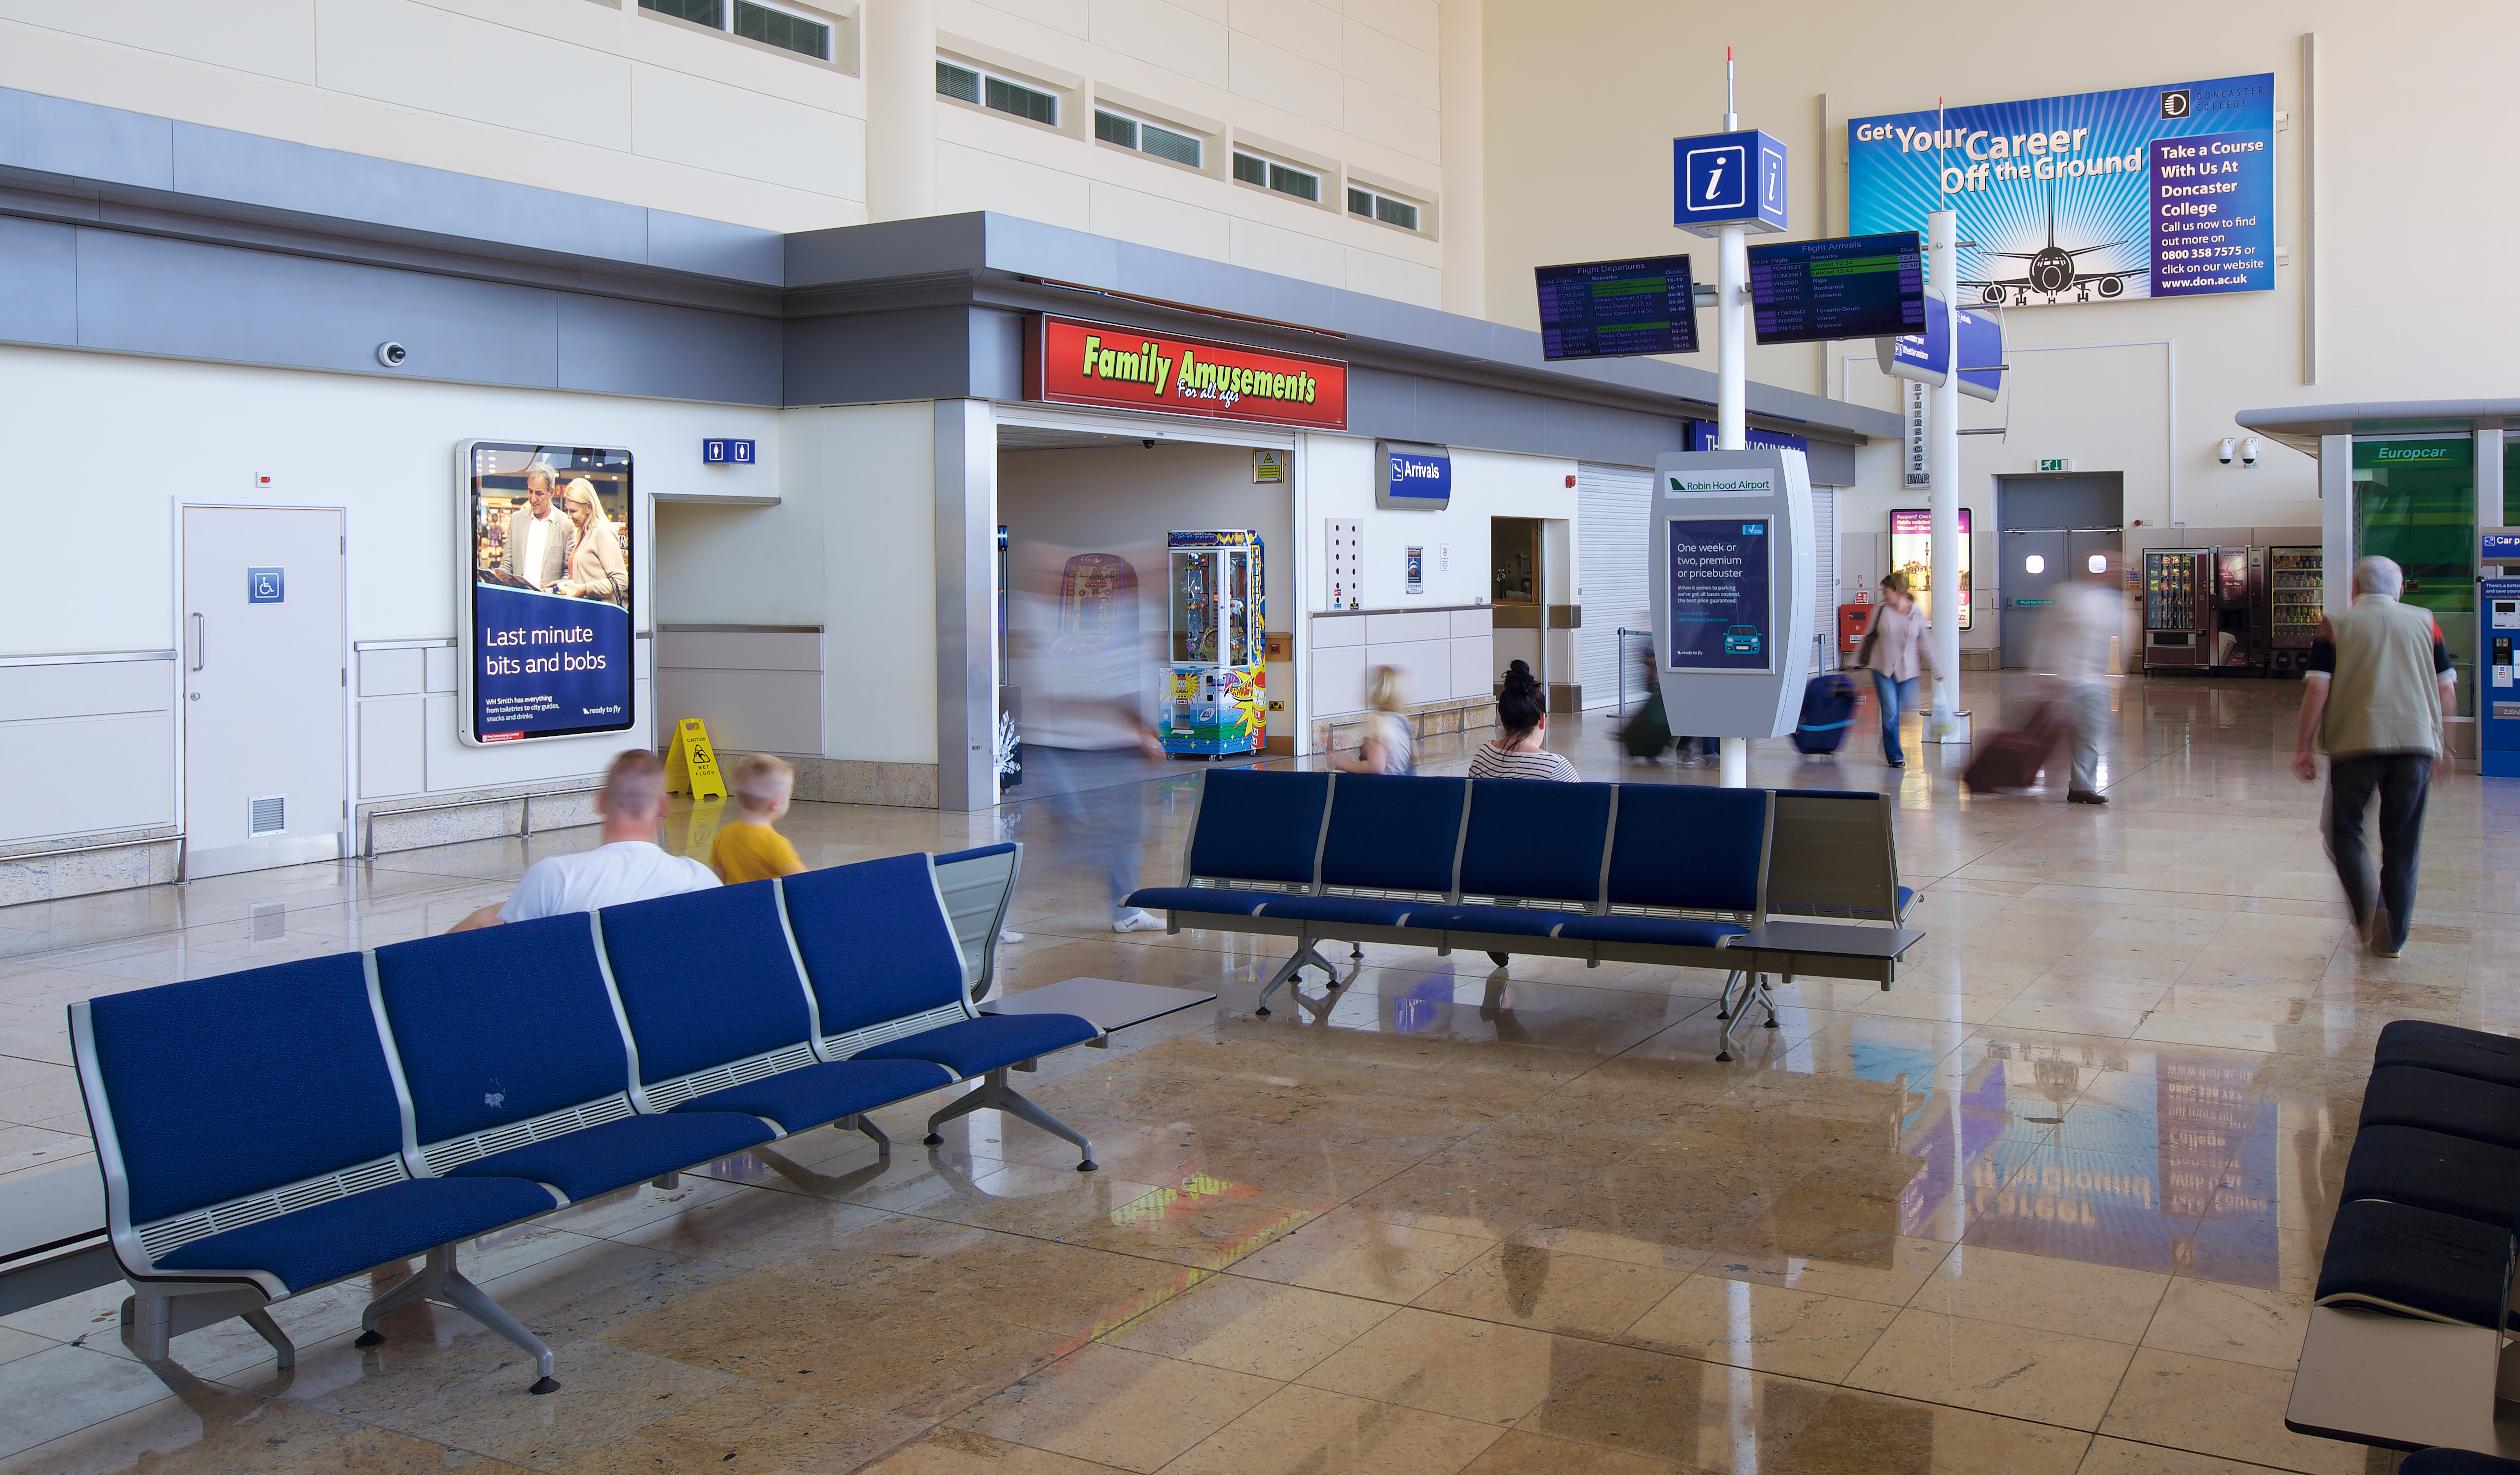 DYP_DSA Terminal 0309.jpg